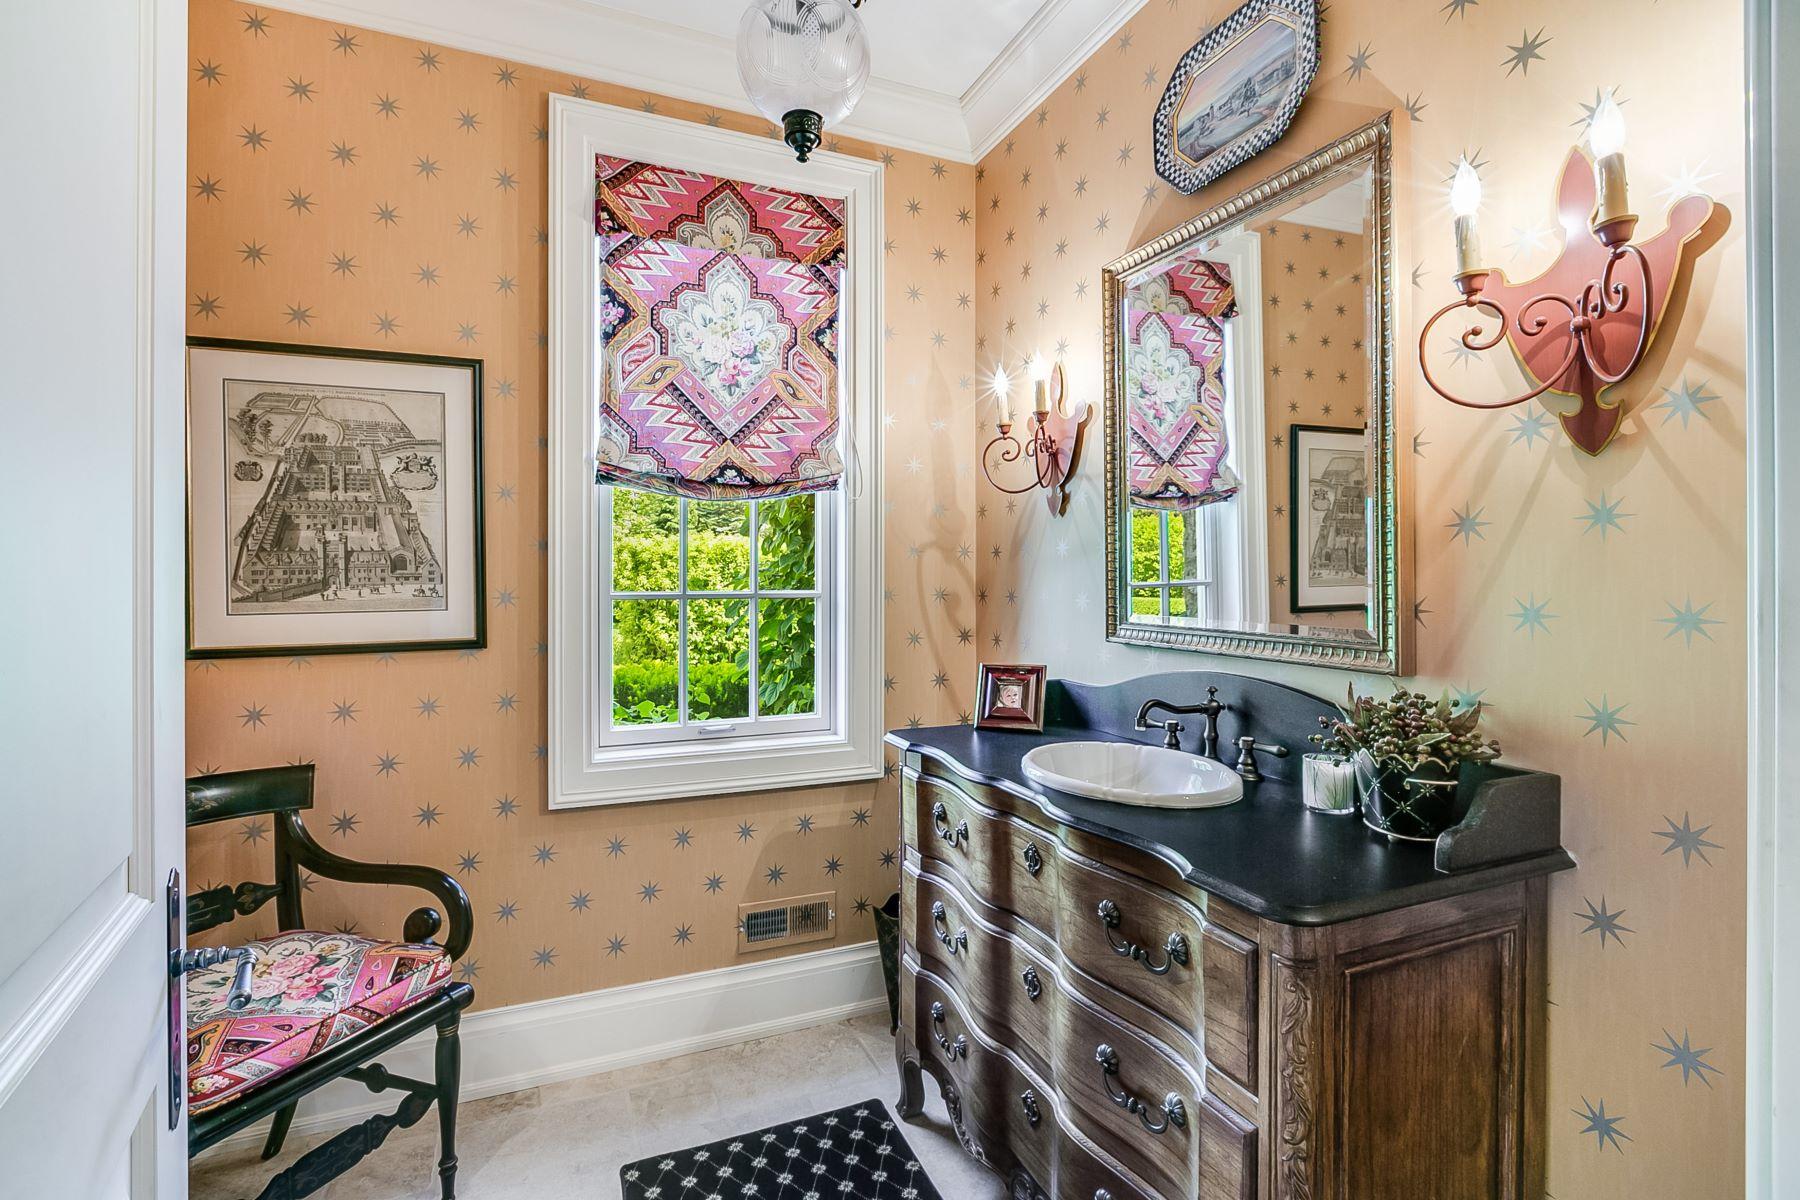 Additional photo for property listing at Remarkable Elm Grove Chateau 14115 Juneau Blvd, Elm Grove, Wisconsin 53122 Estados Unidos